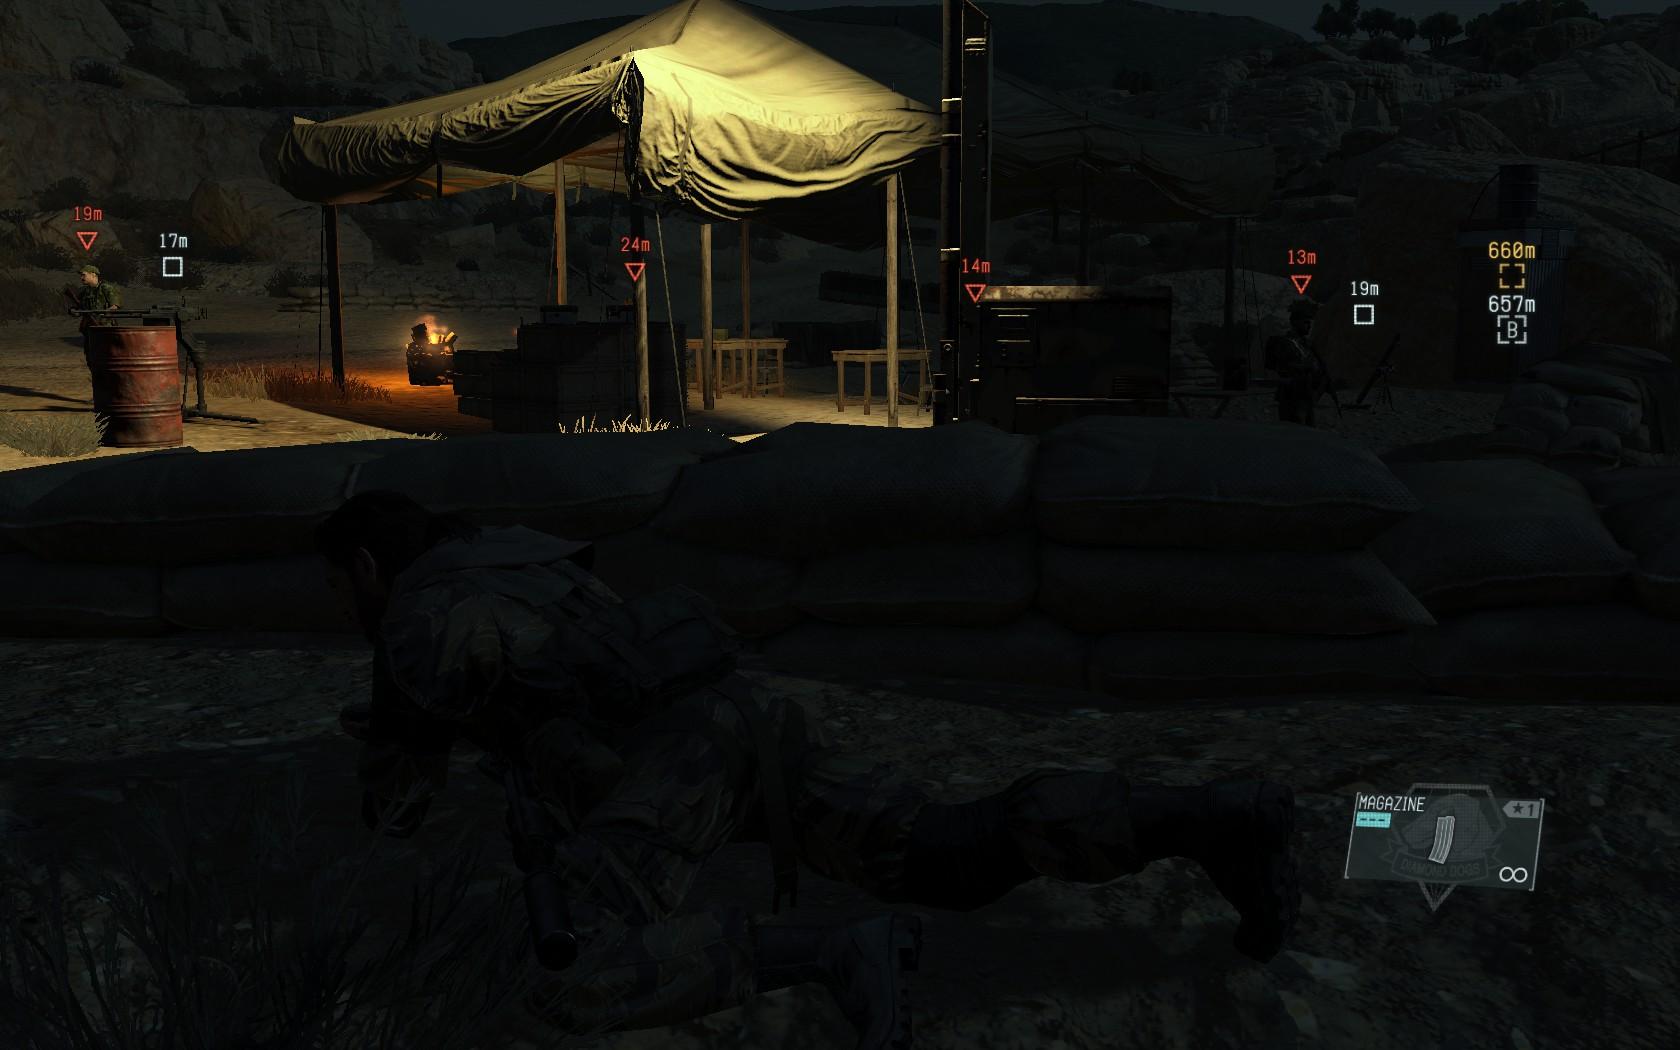 Metal Gear Solid V: The Phantom Pain 113733